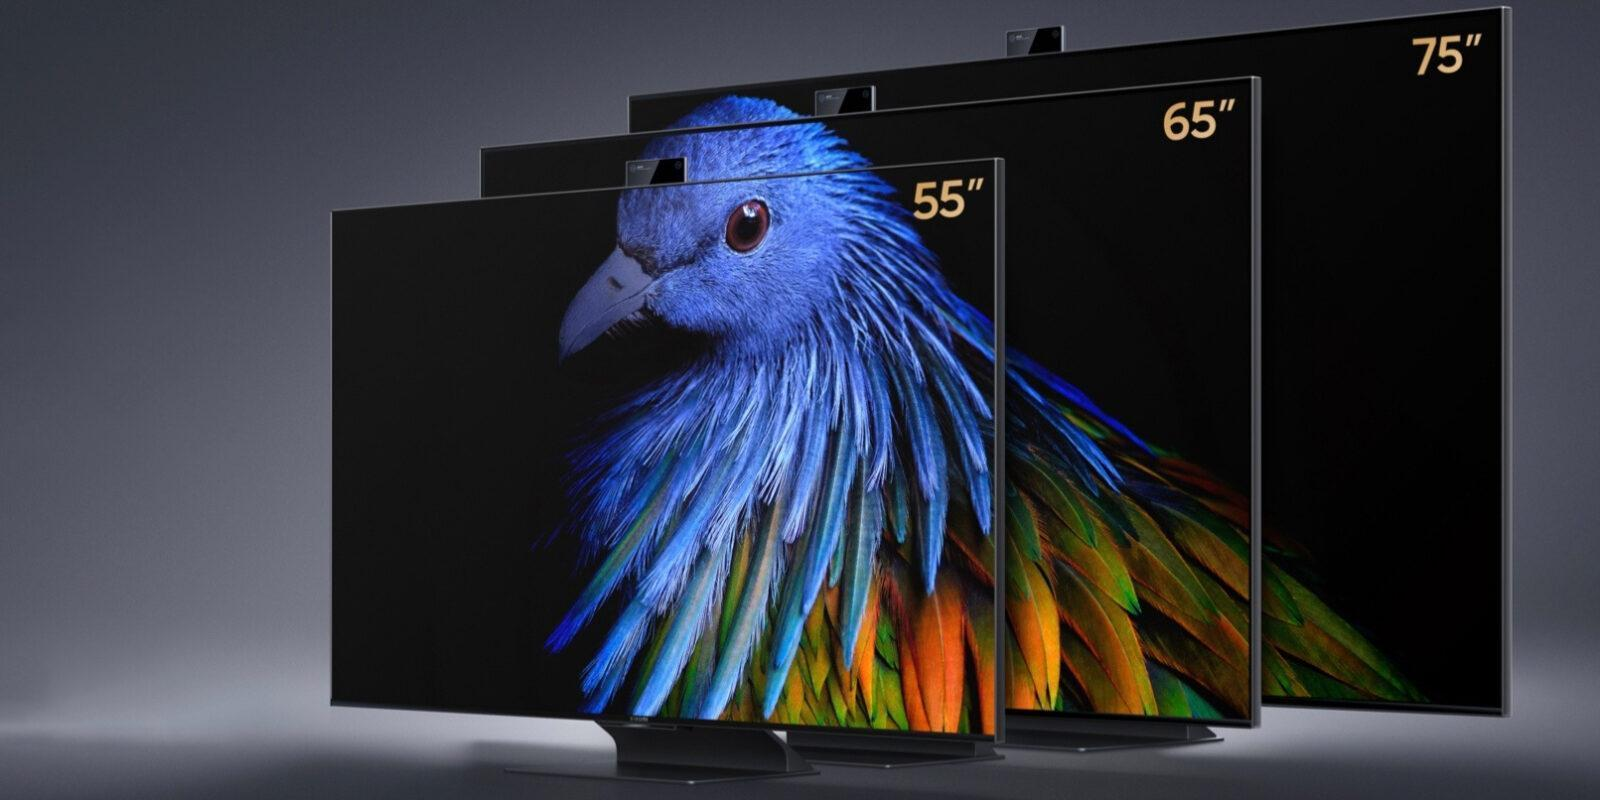 Xiaomi представила два новых телевизора (xiaomi mi tv 6 televisores 5 1624882299 1)